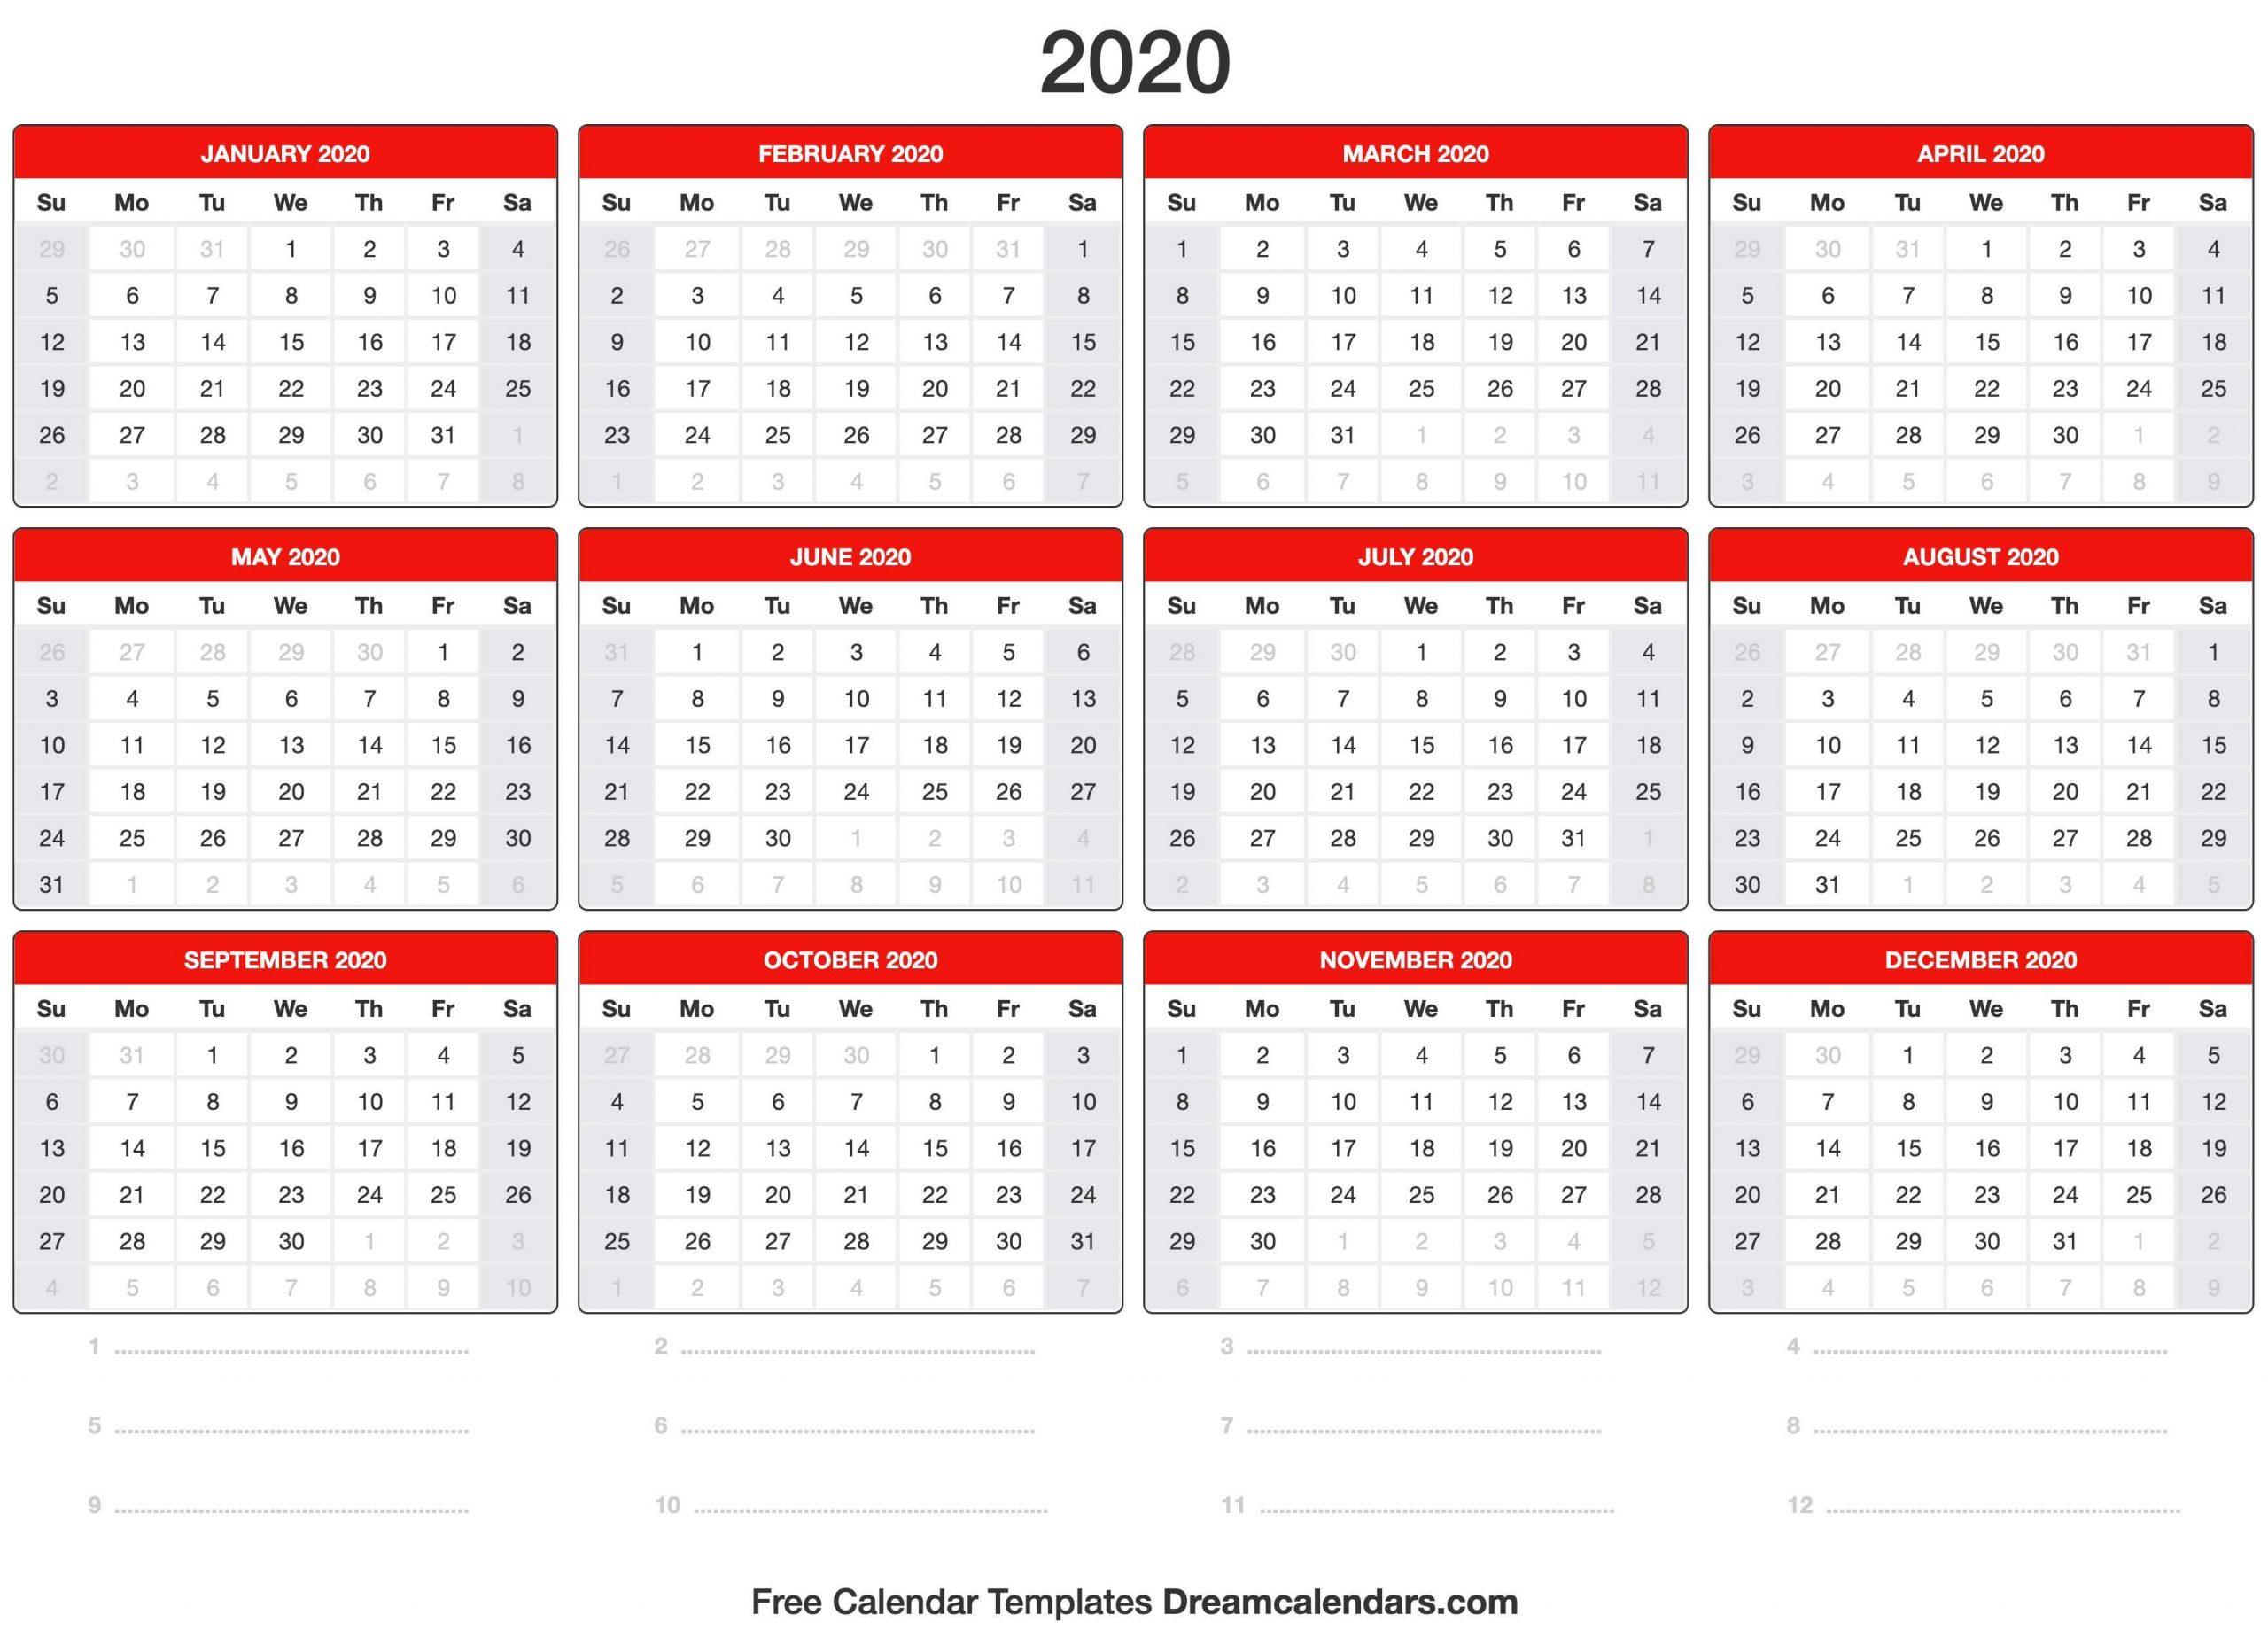 Dream Calendars - Make Your Calendar Template Blog Free 2020 Calendar With Days Counted 1-365